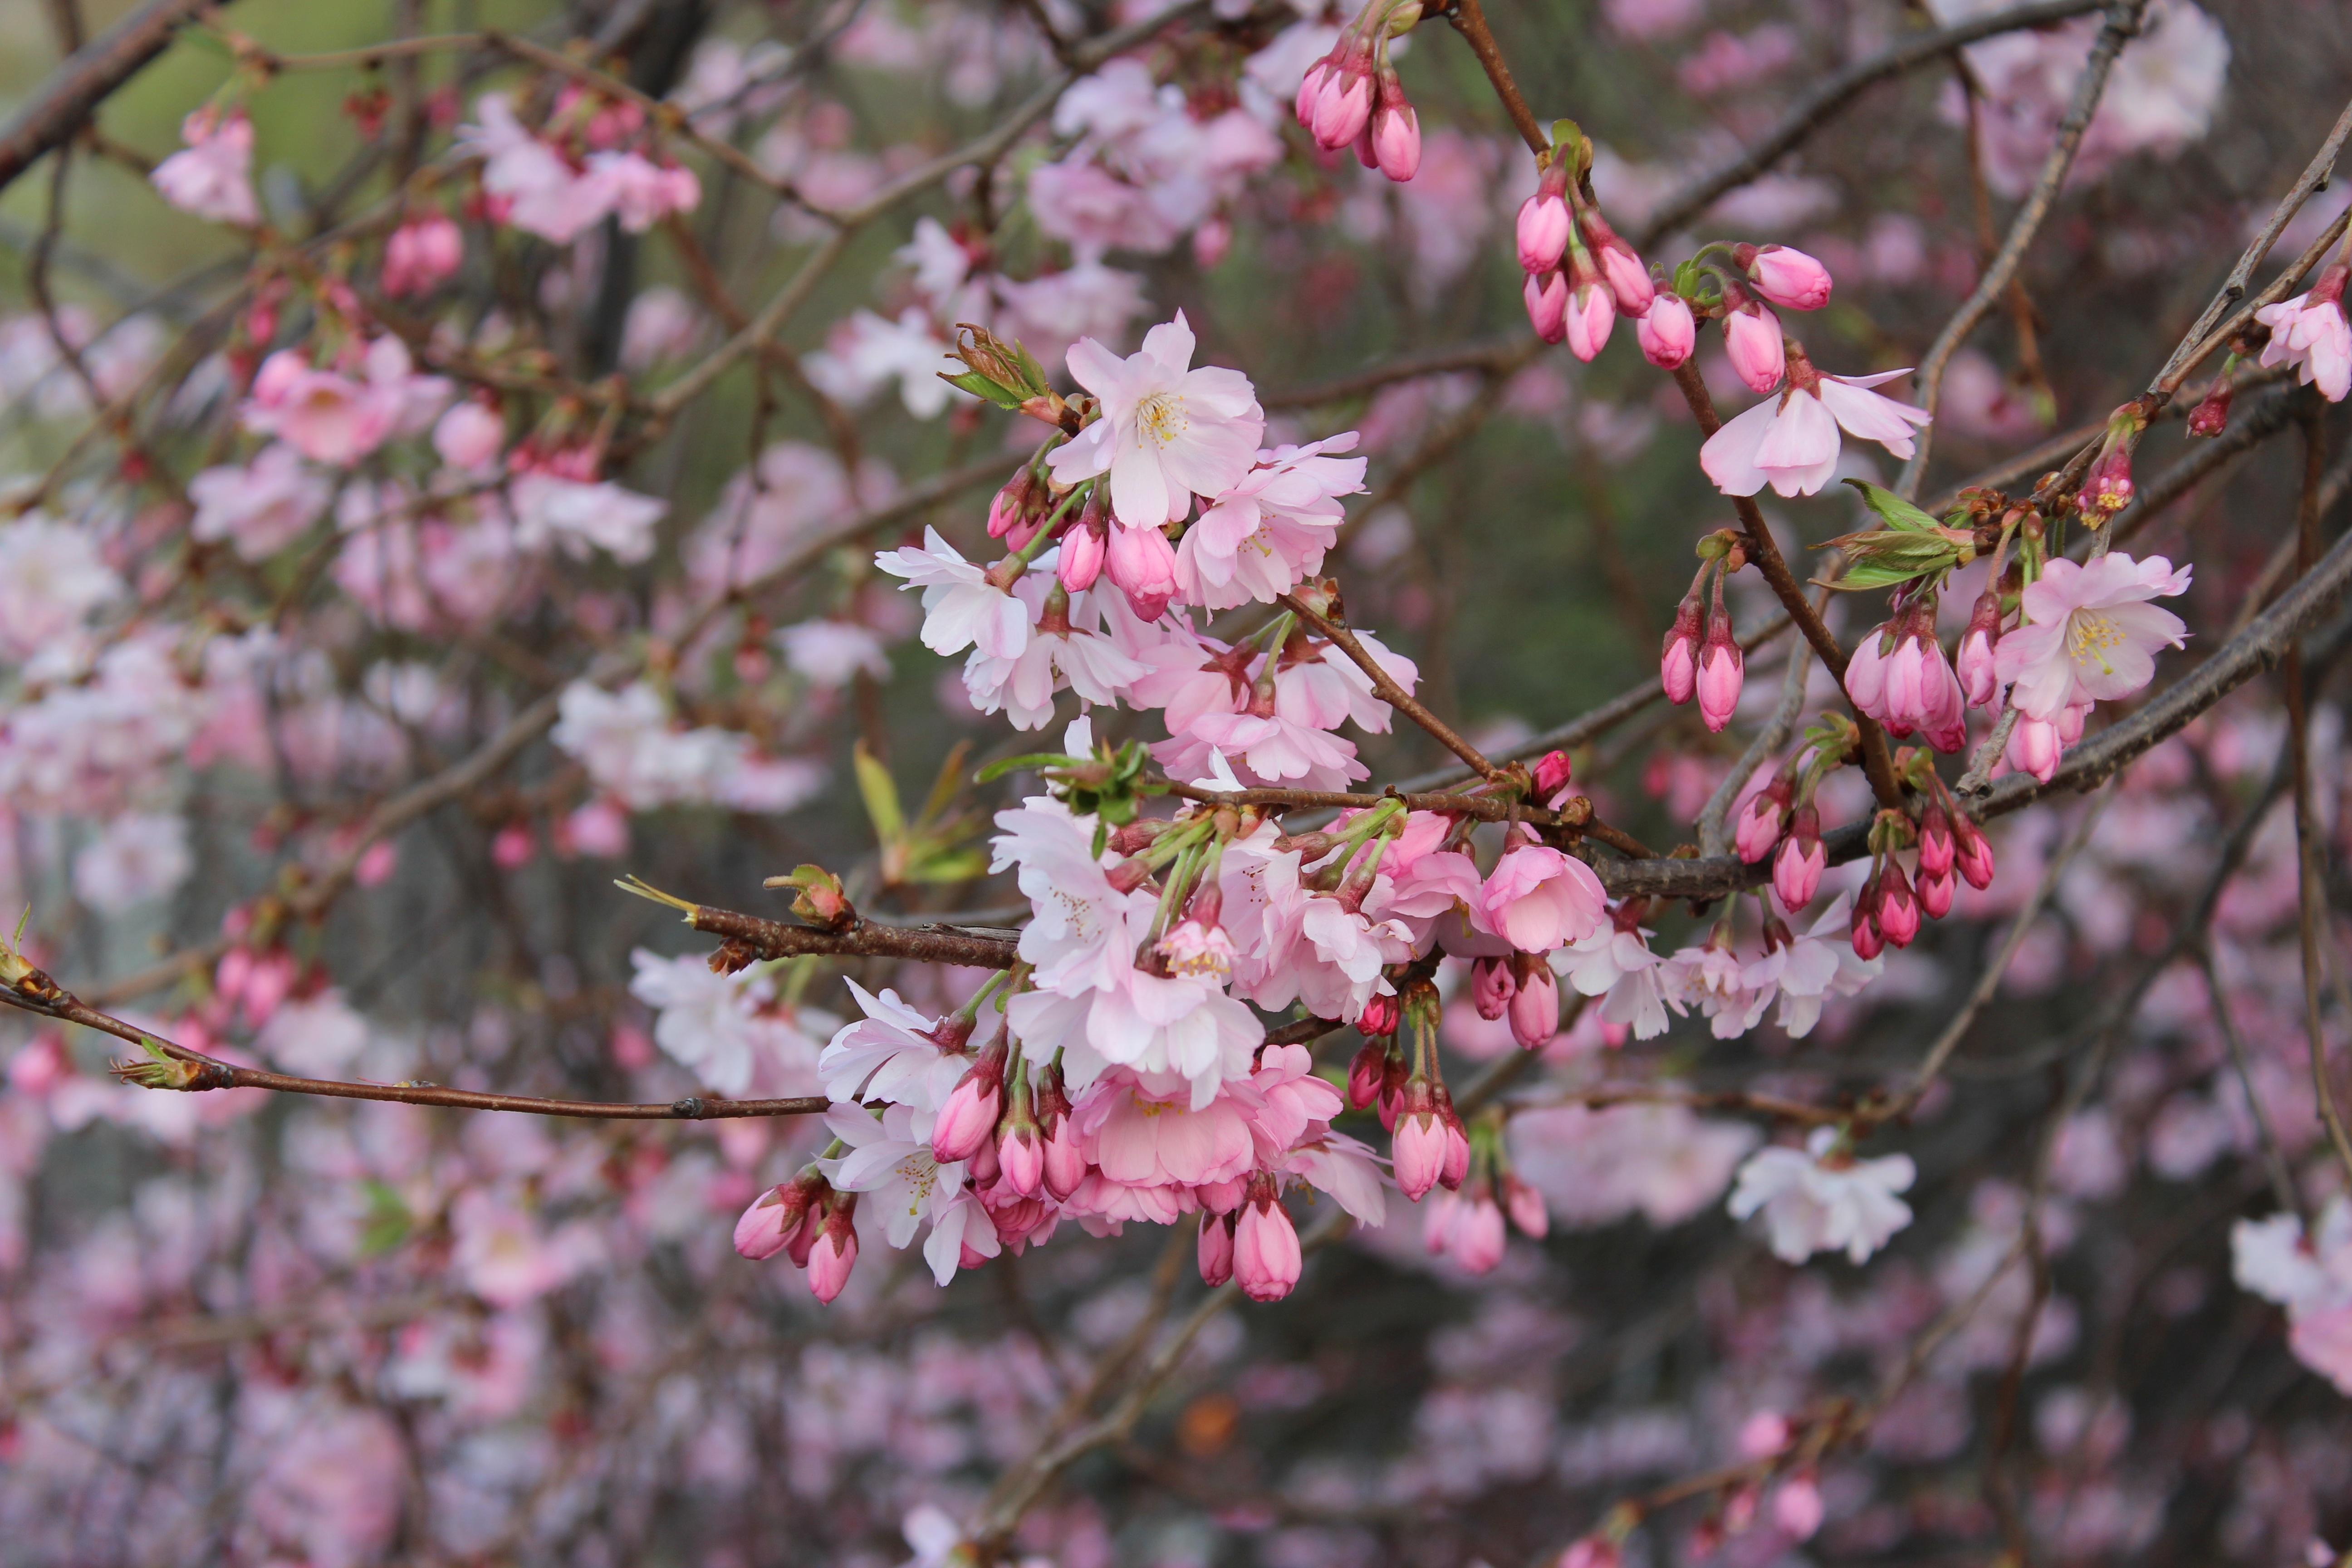 Free images branch flower petal bloom food produce japan branch blossom plant flower petal bloom food spring produce japan cherry blossom plants flowers trees london mightylinksfo